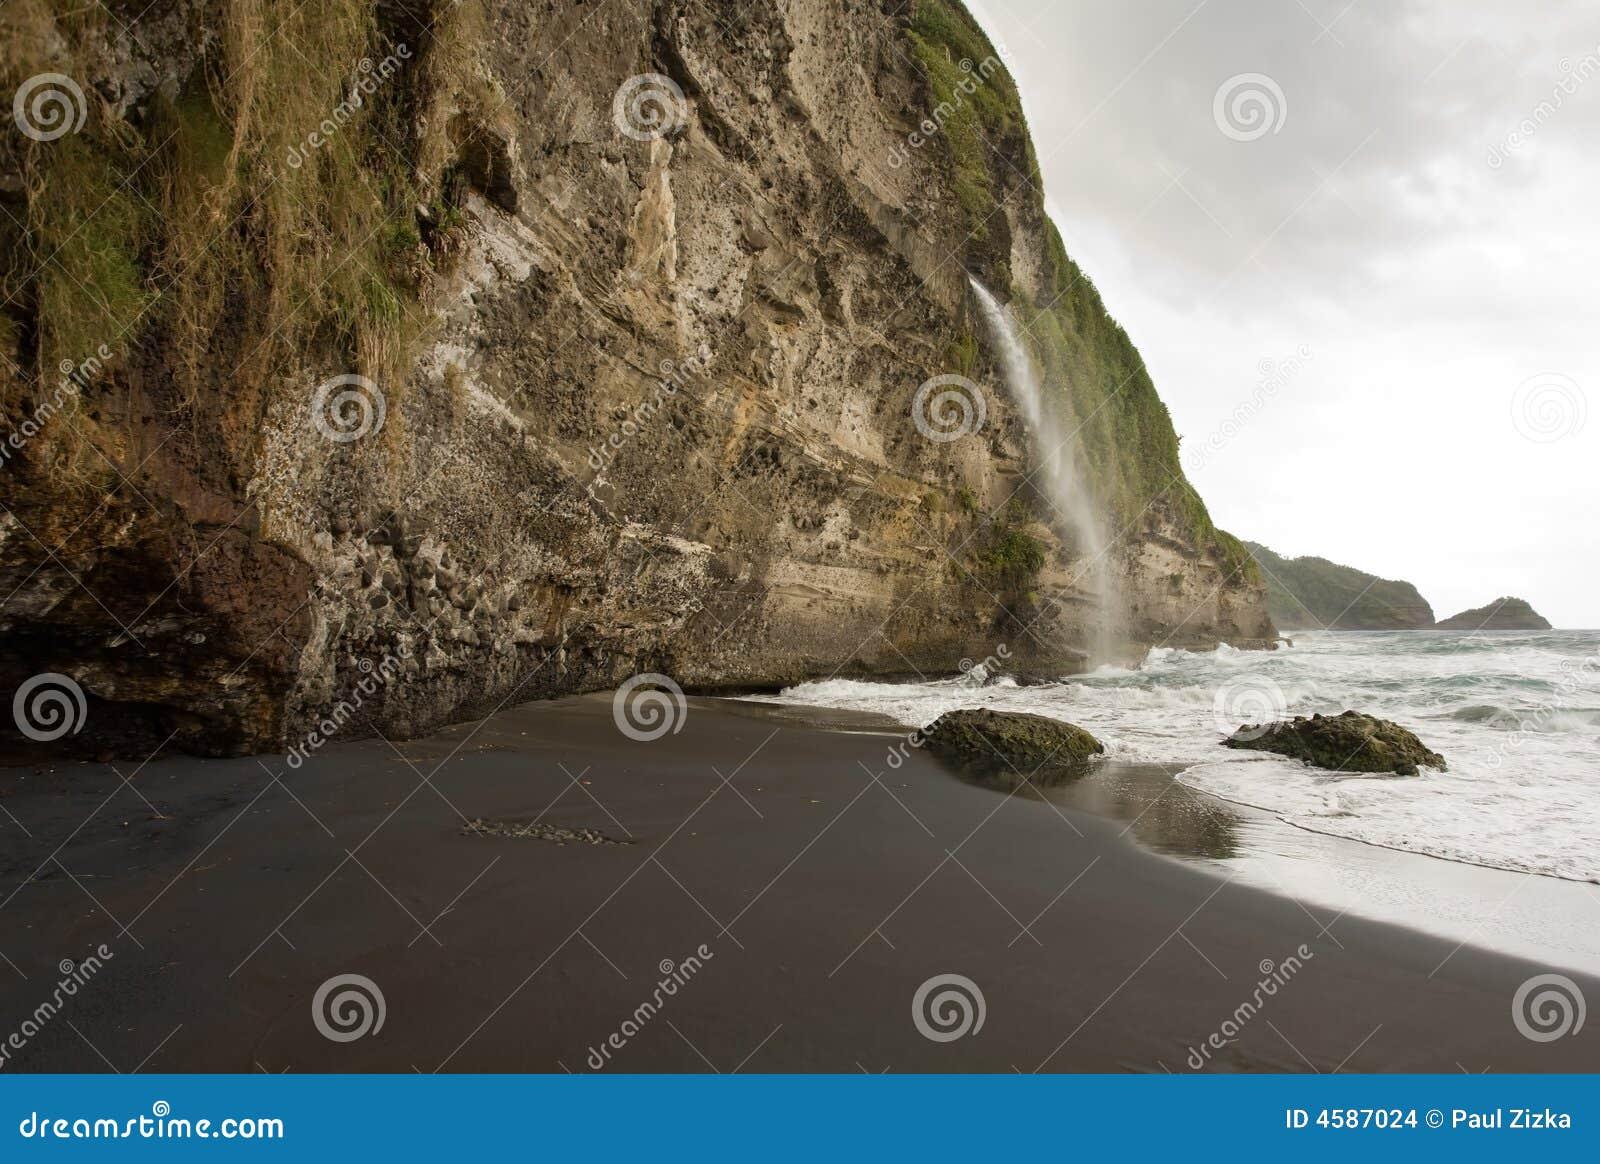 Dominica Explorations